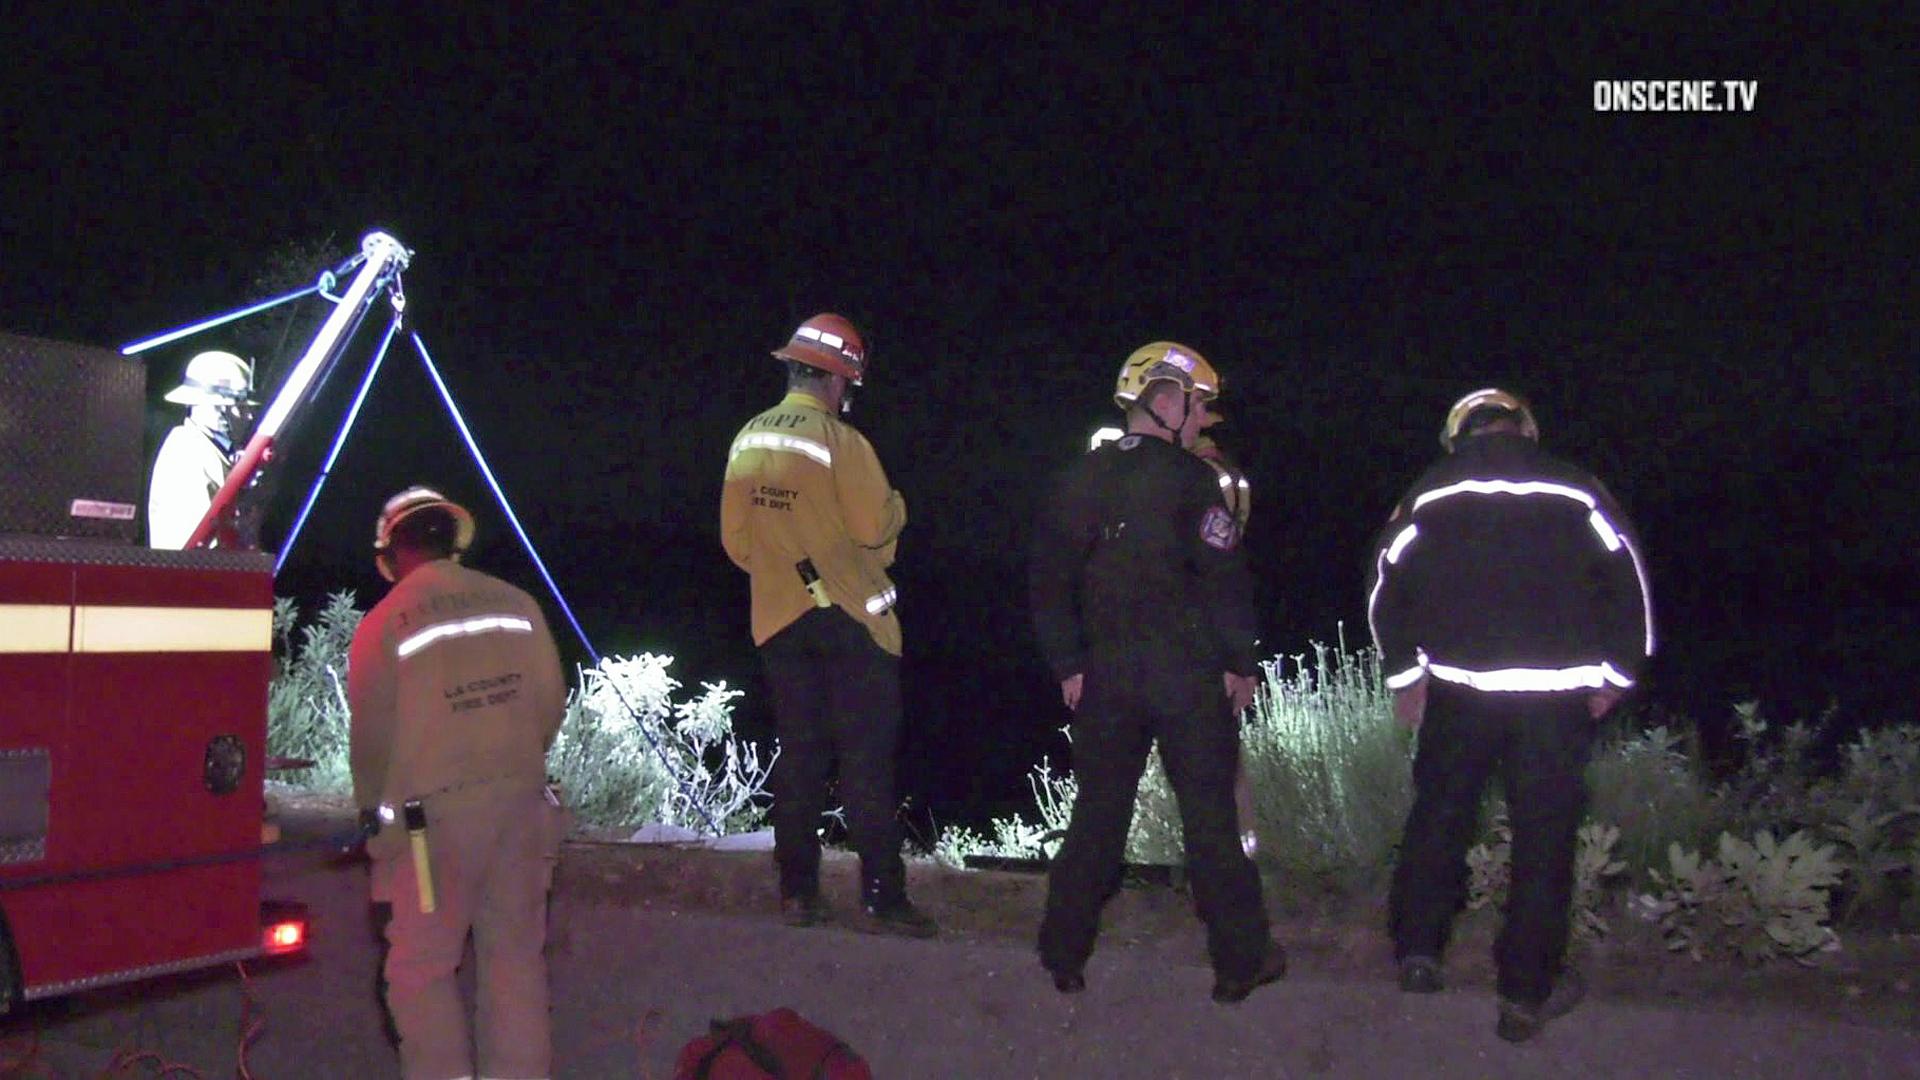 Rescue crews respond to a crash on Angeles Crest Highway on June 3, 2019. (Credit: OnScene.TV)